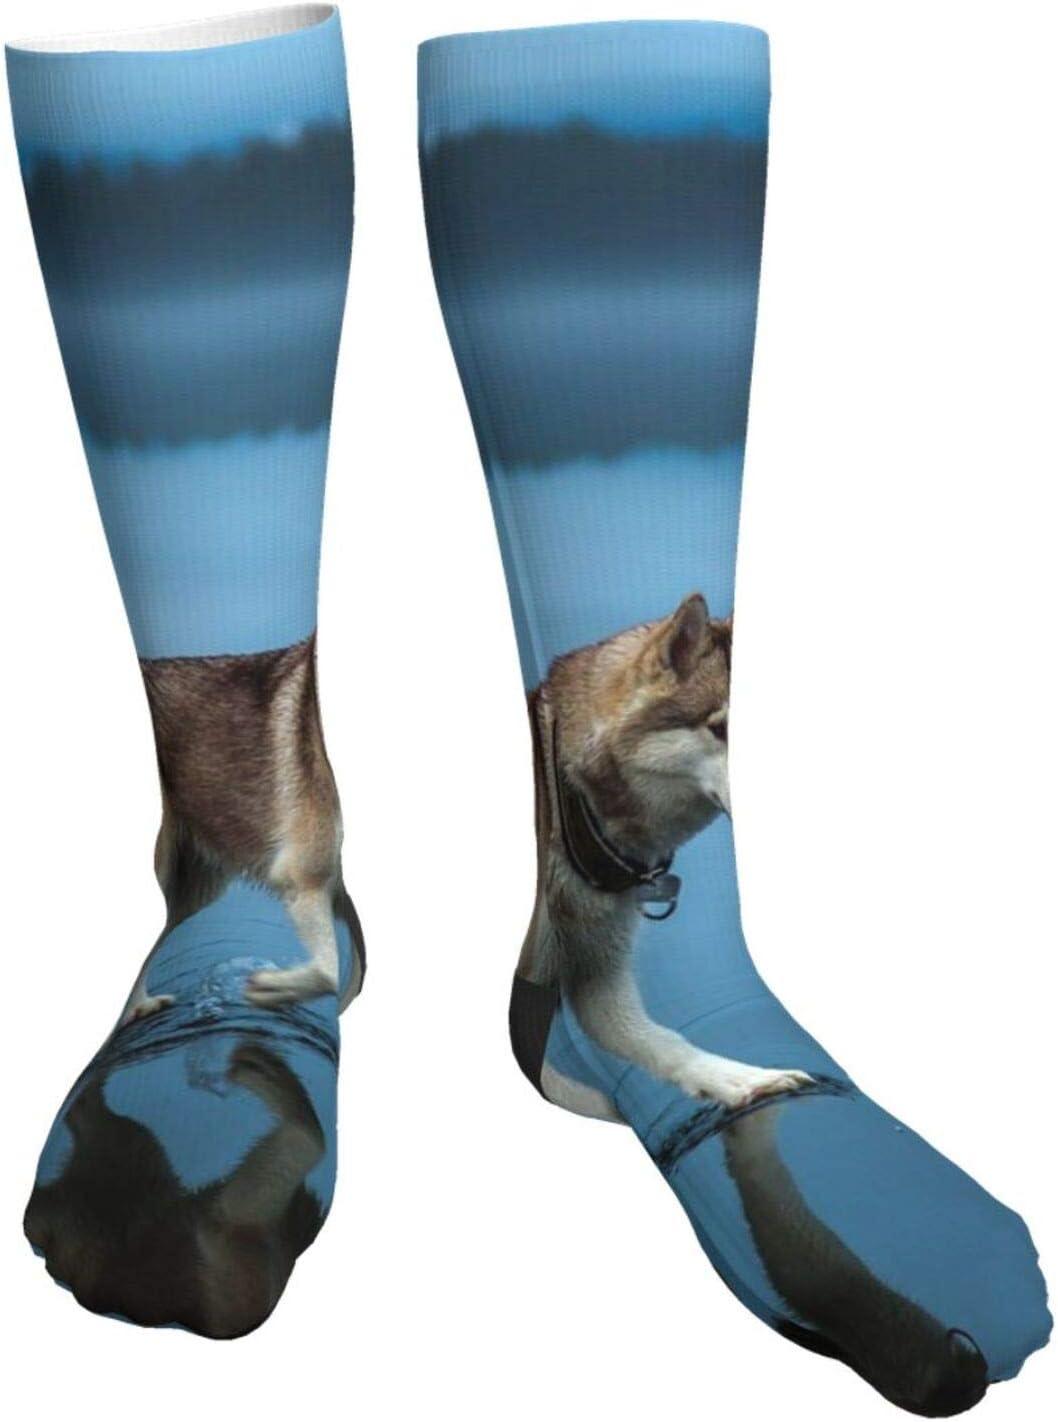 Compression Socks Women /& Men Pregnancy Best for Running,Athletic,Sports,Flight Travel